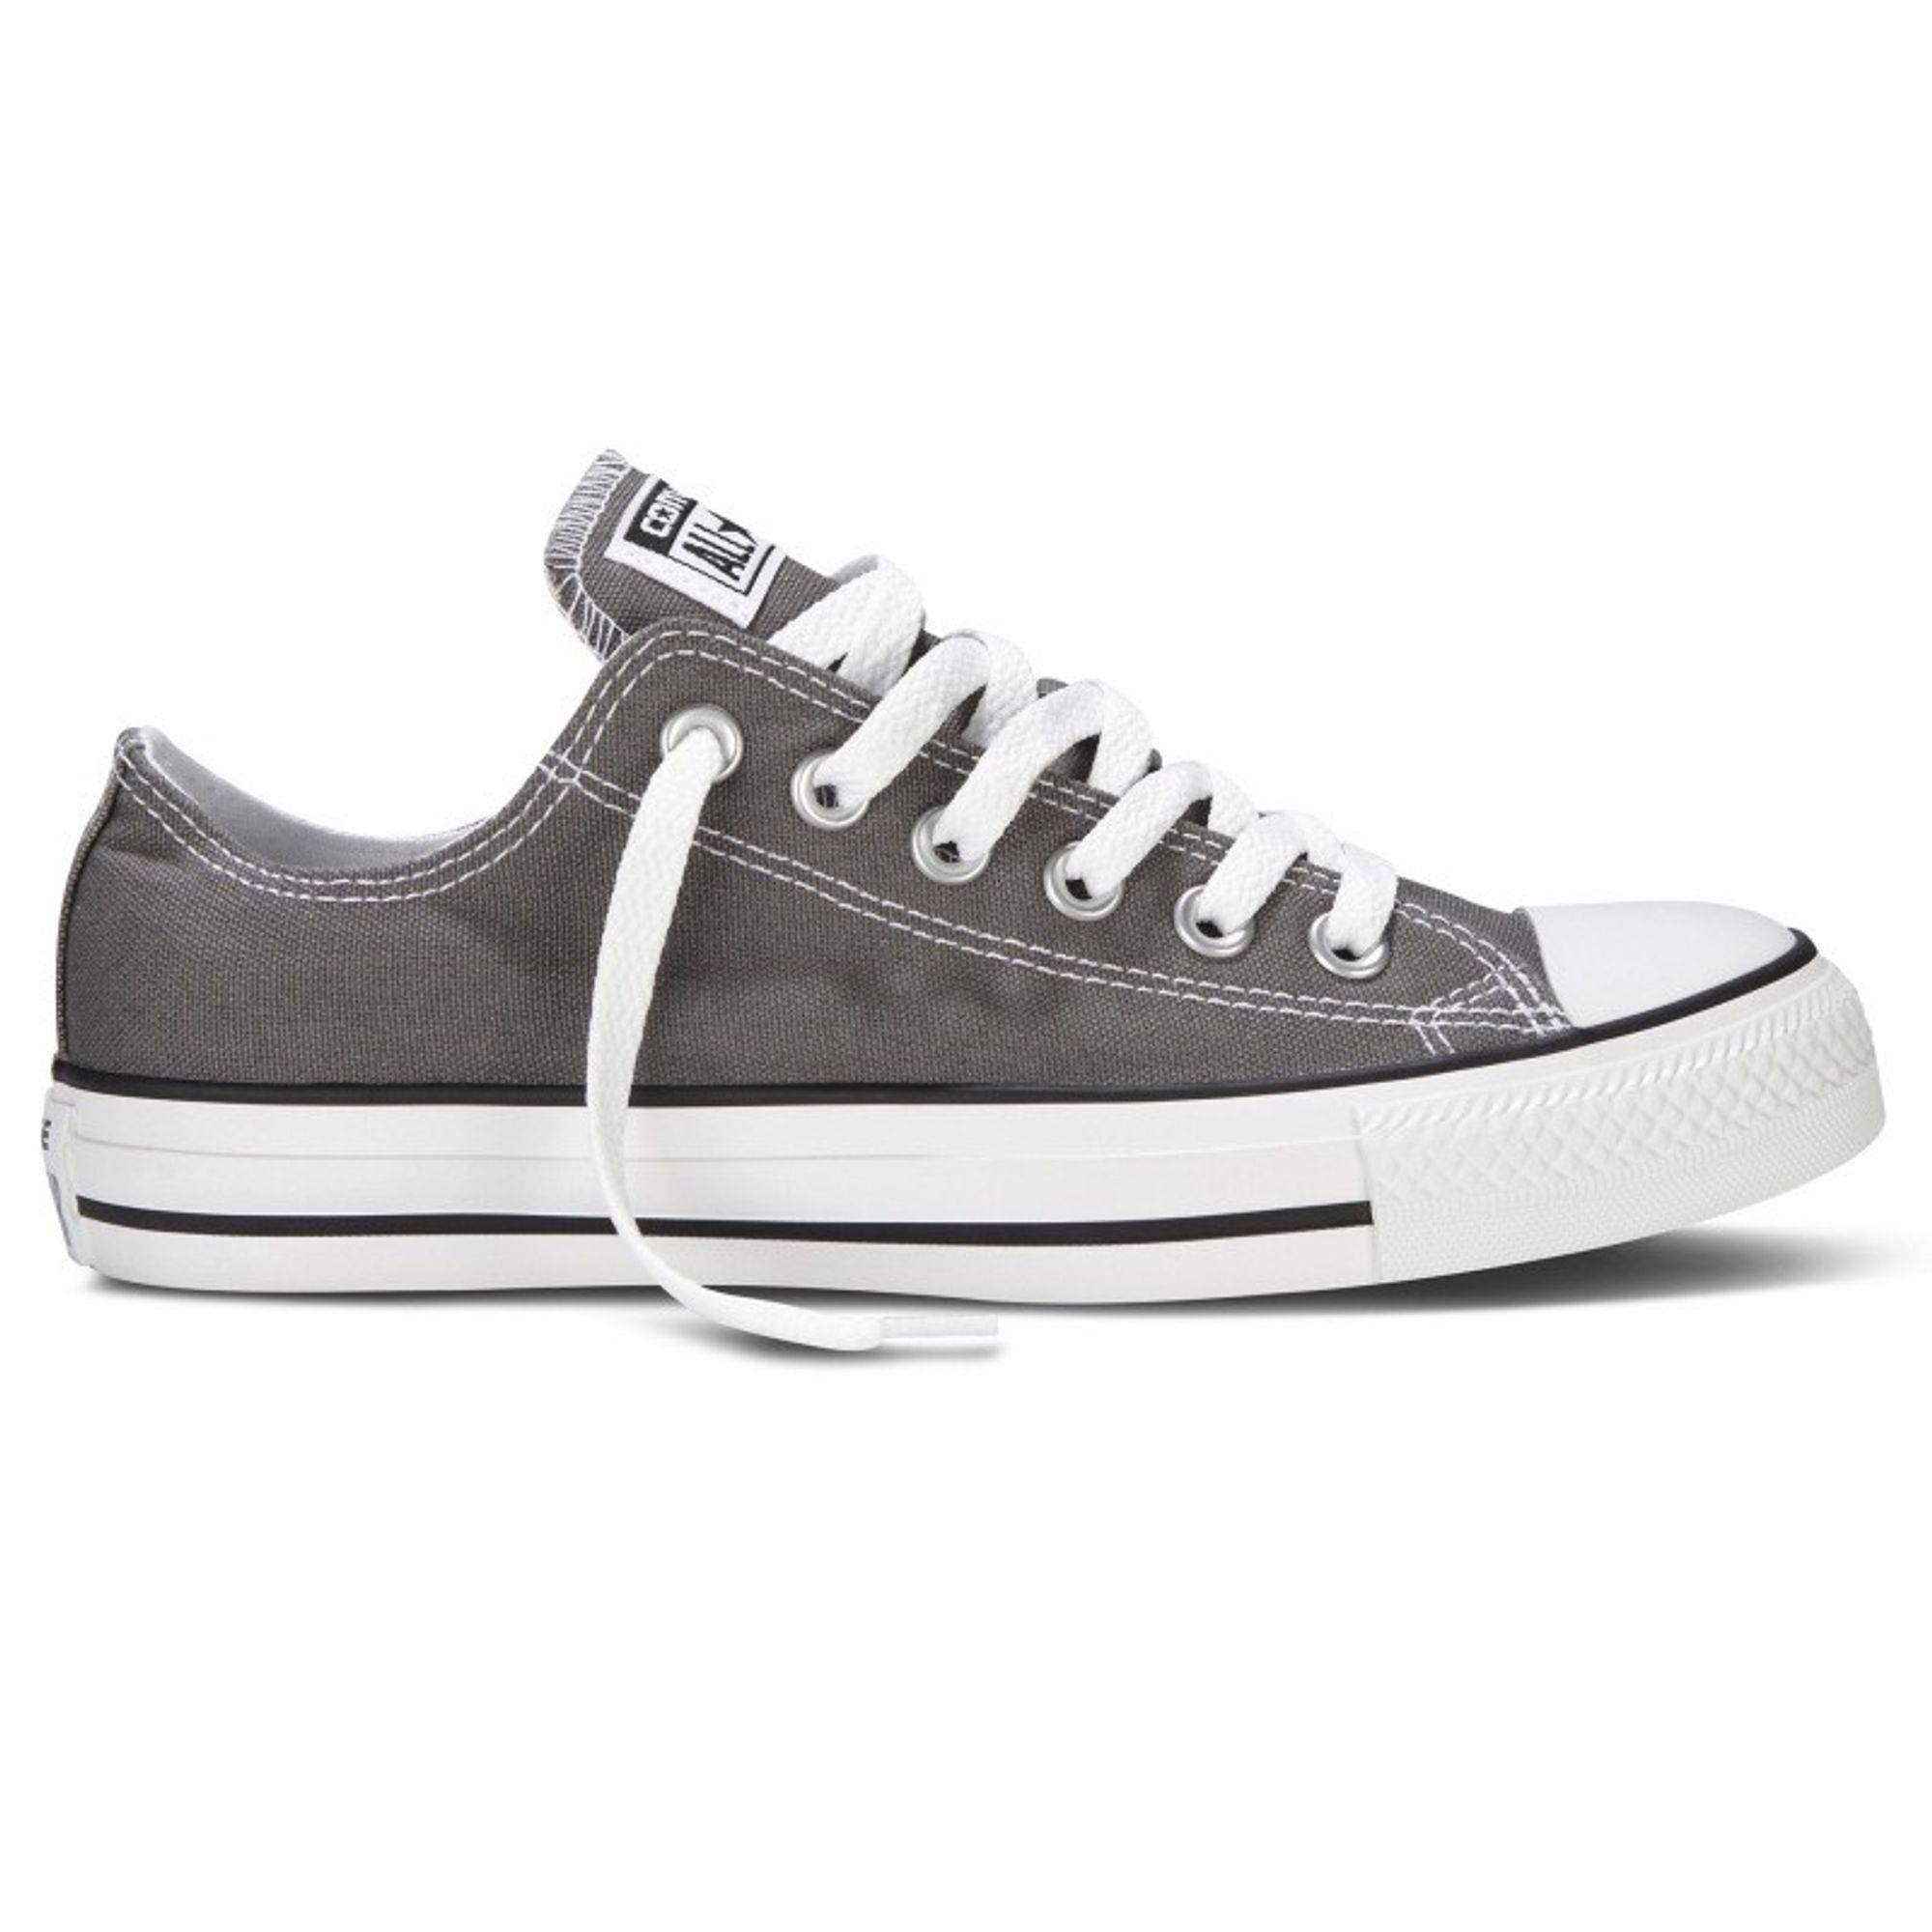 Converse Damen Schuhe All Star Ox Grau 1J794C Sneakers Chucks Gr. 40 | starlabels outdoor lifestyle leder